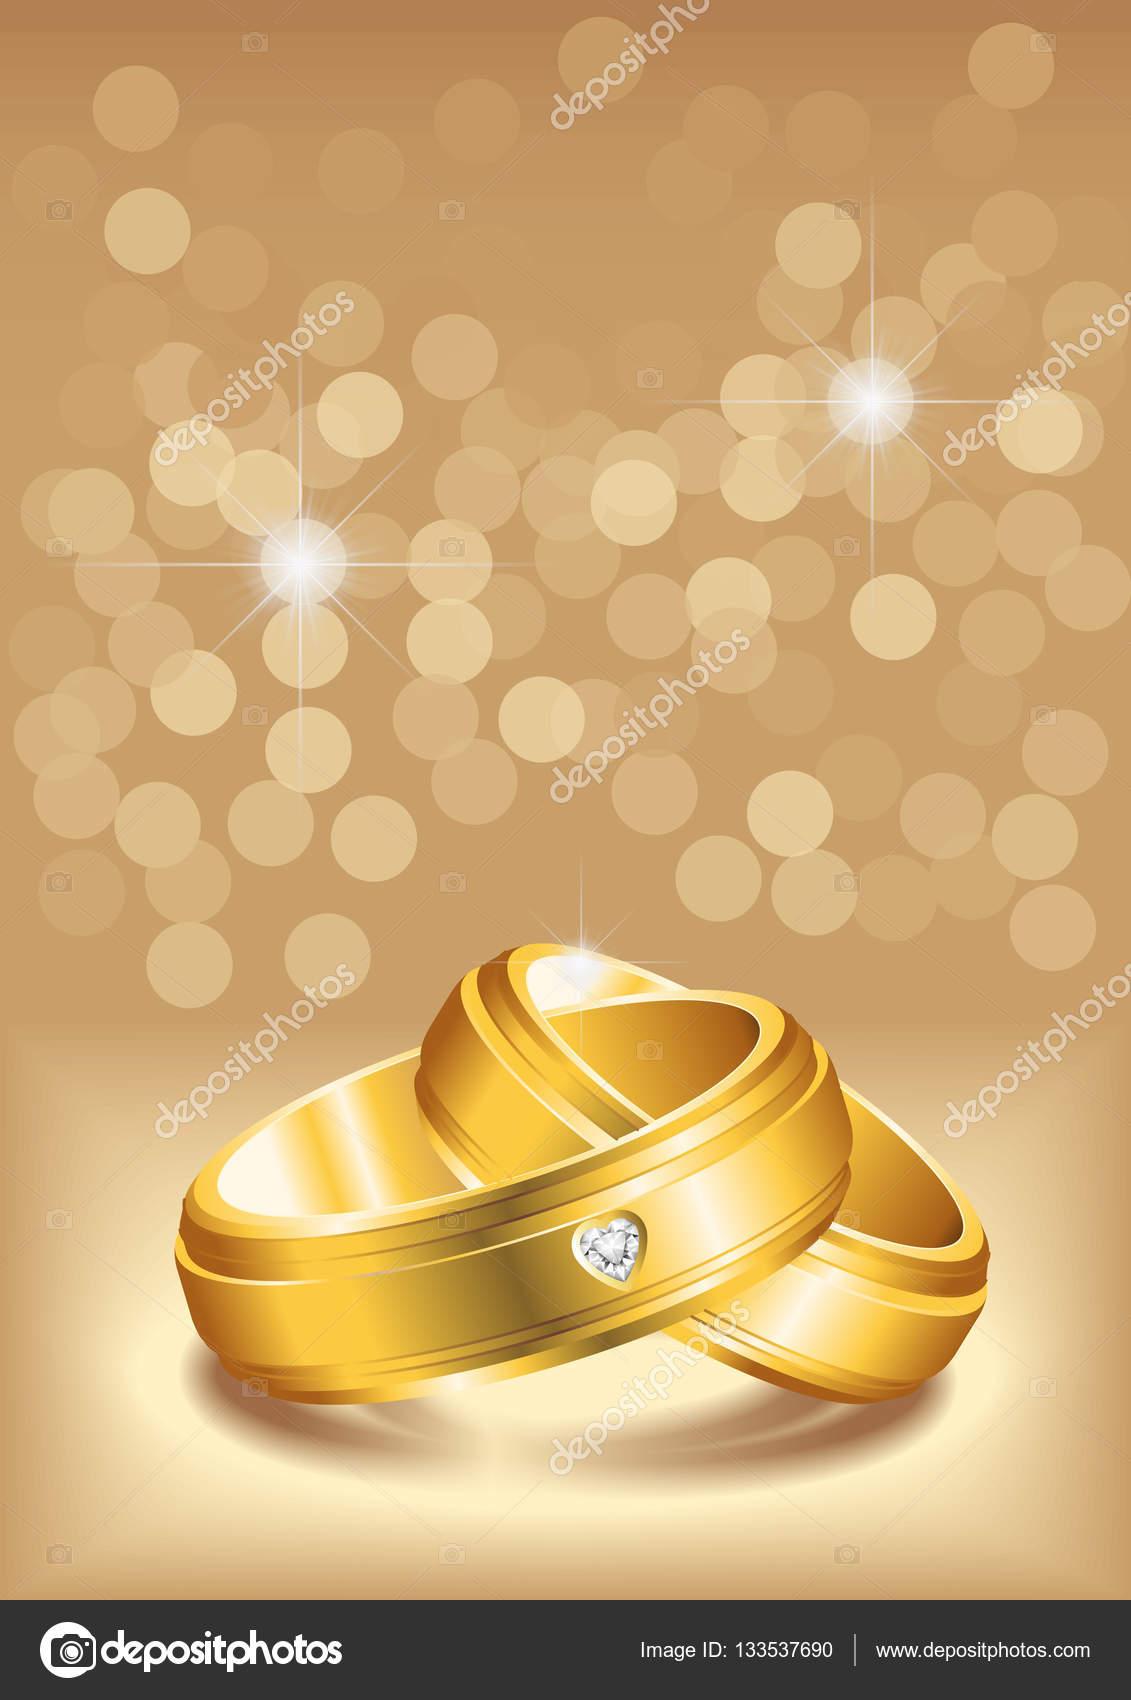 Fondo Para Para Bodas De Oro Allenjoy Fotografa Telones